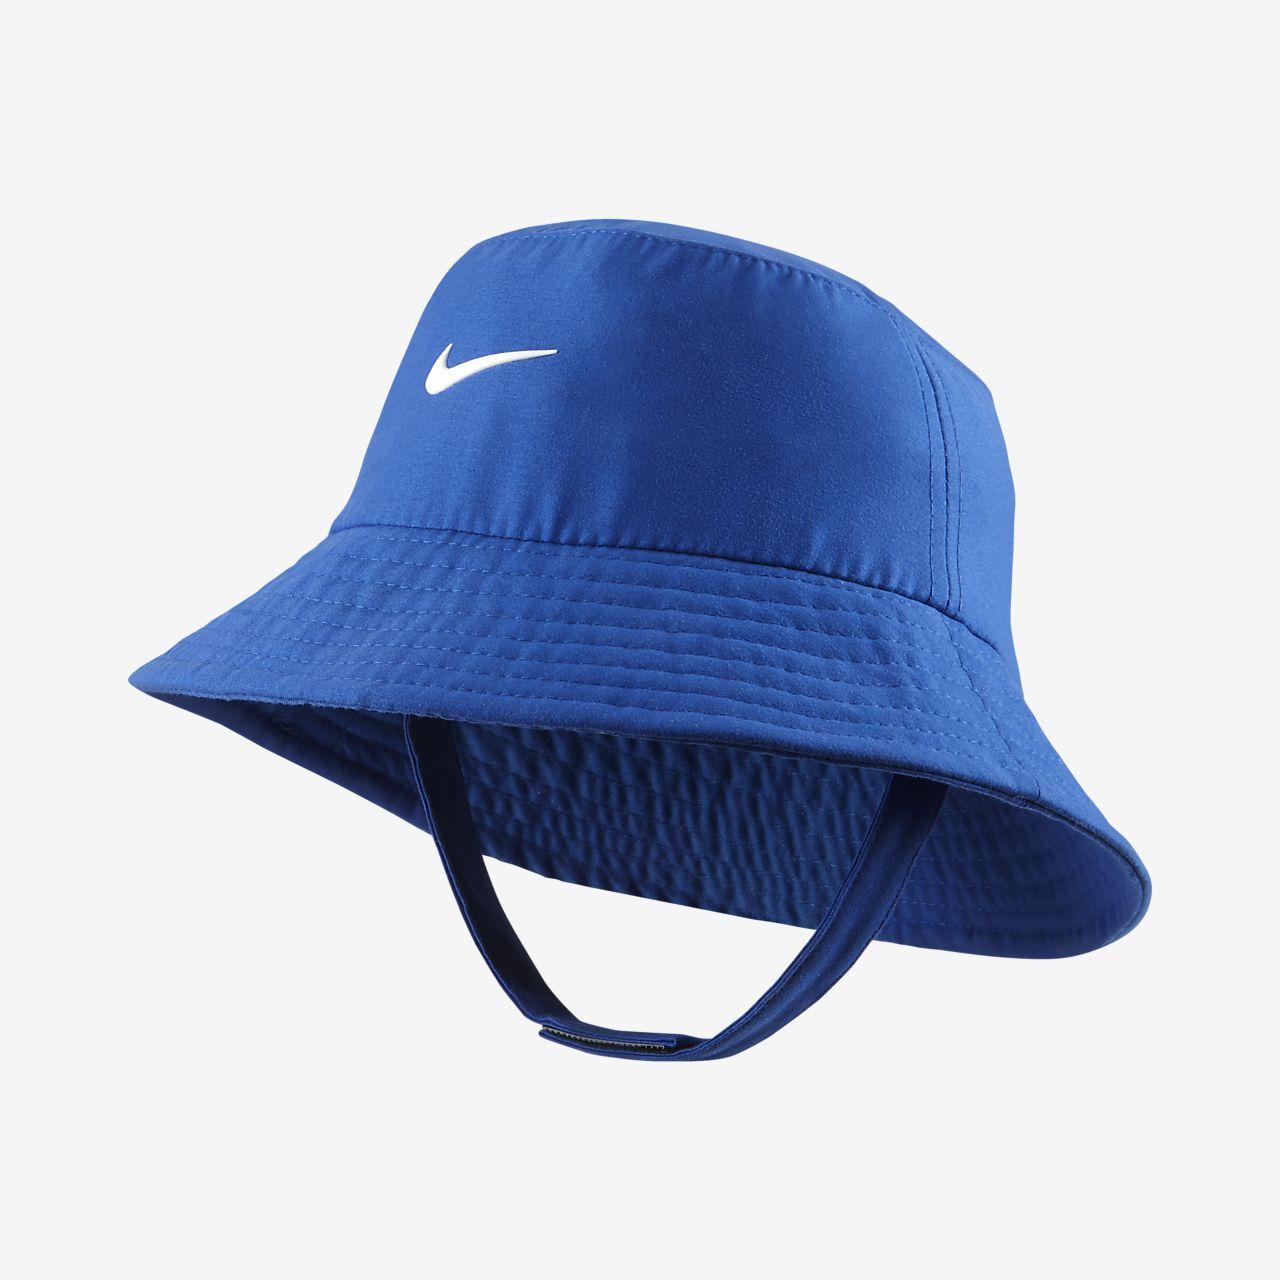 e840cb59 ... shopping nike dri fit baby toddler bucket hat f9617 bcd9e